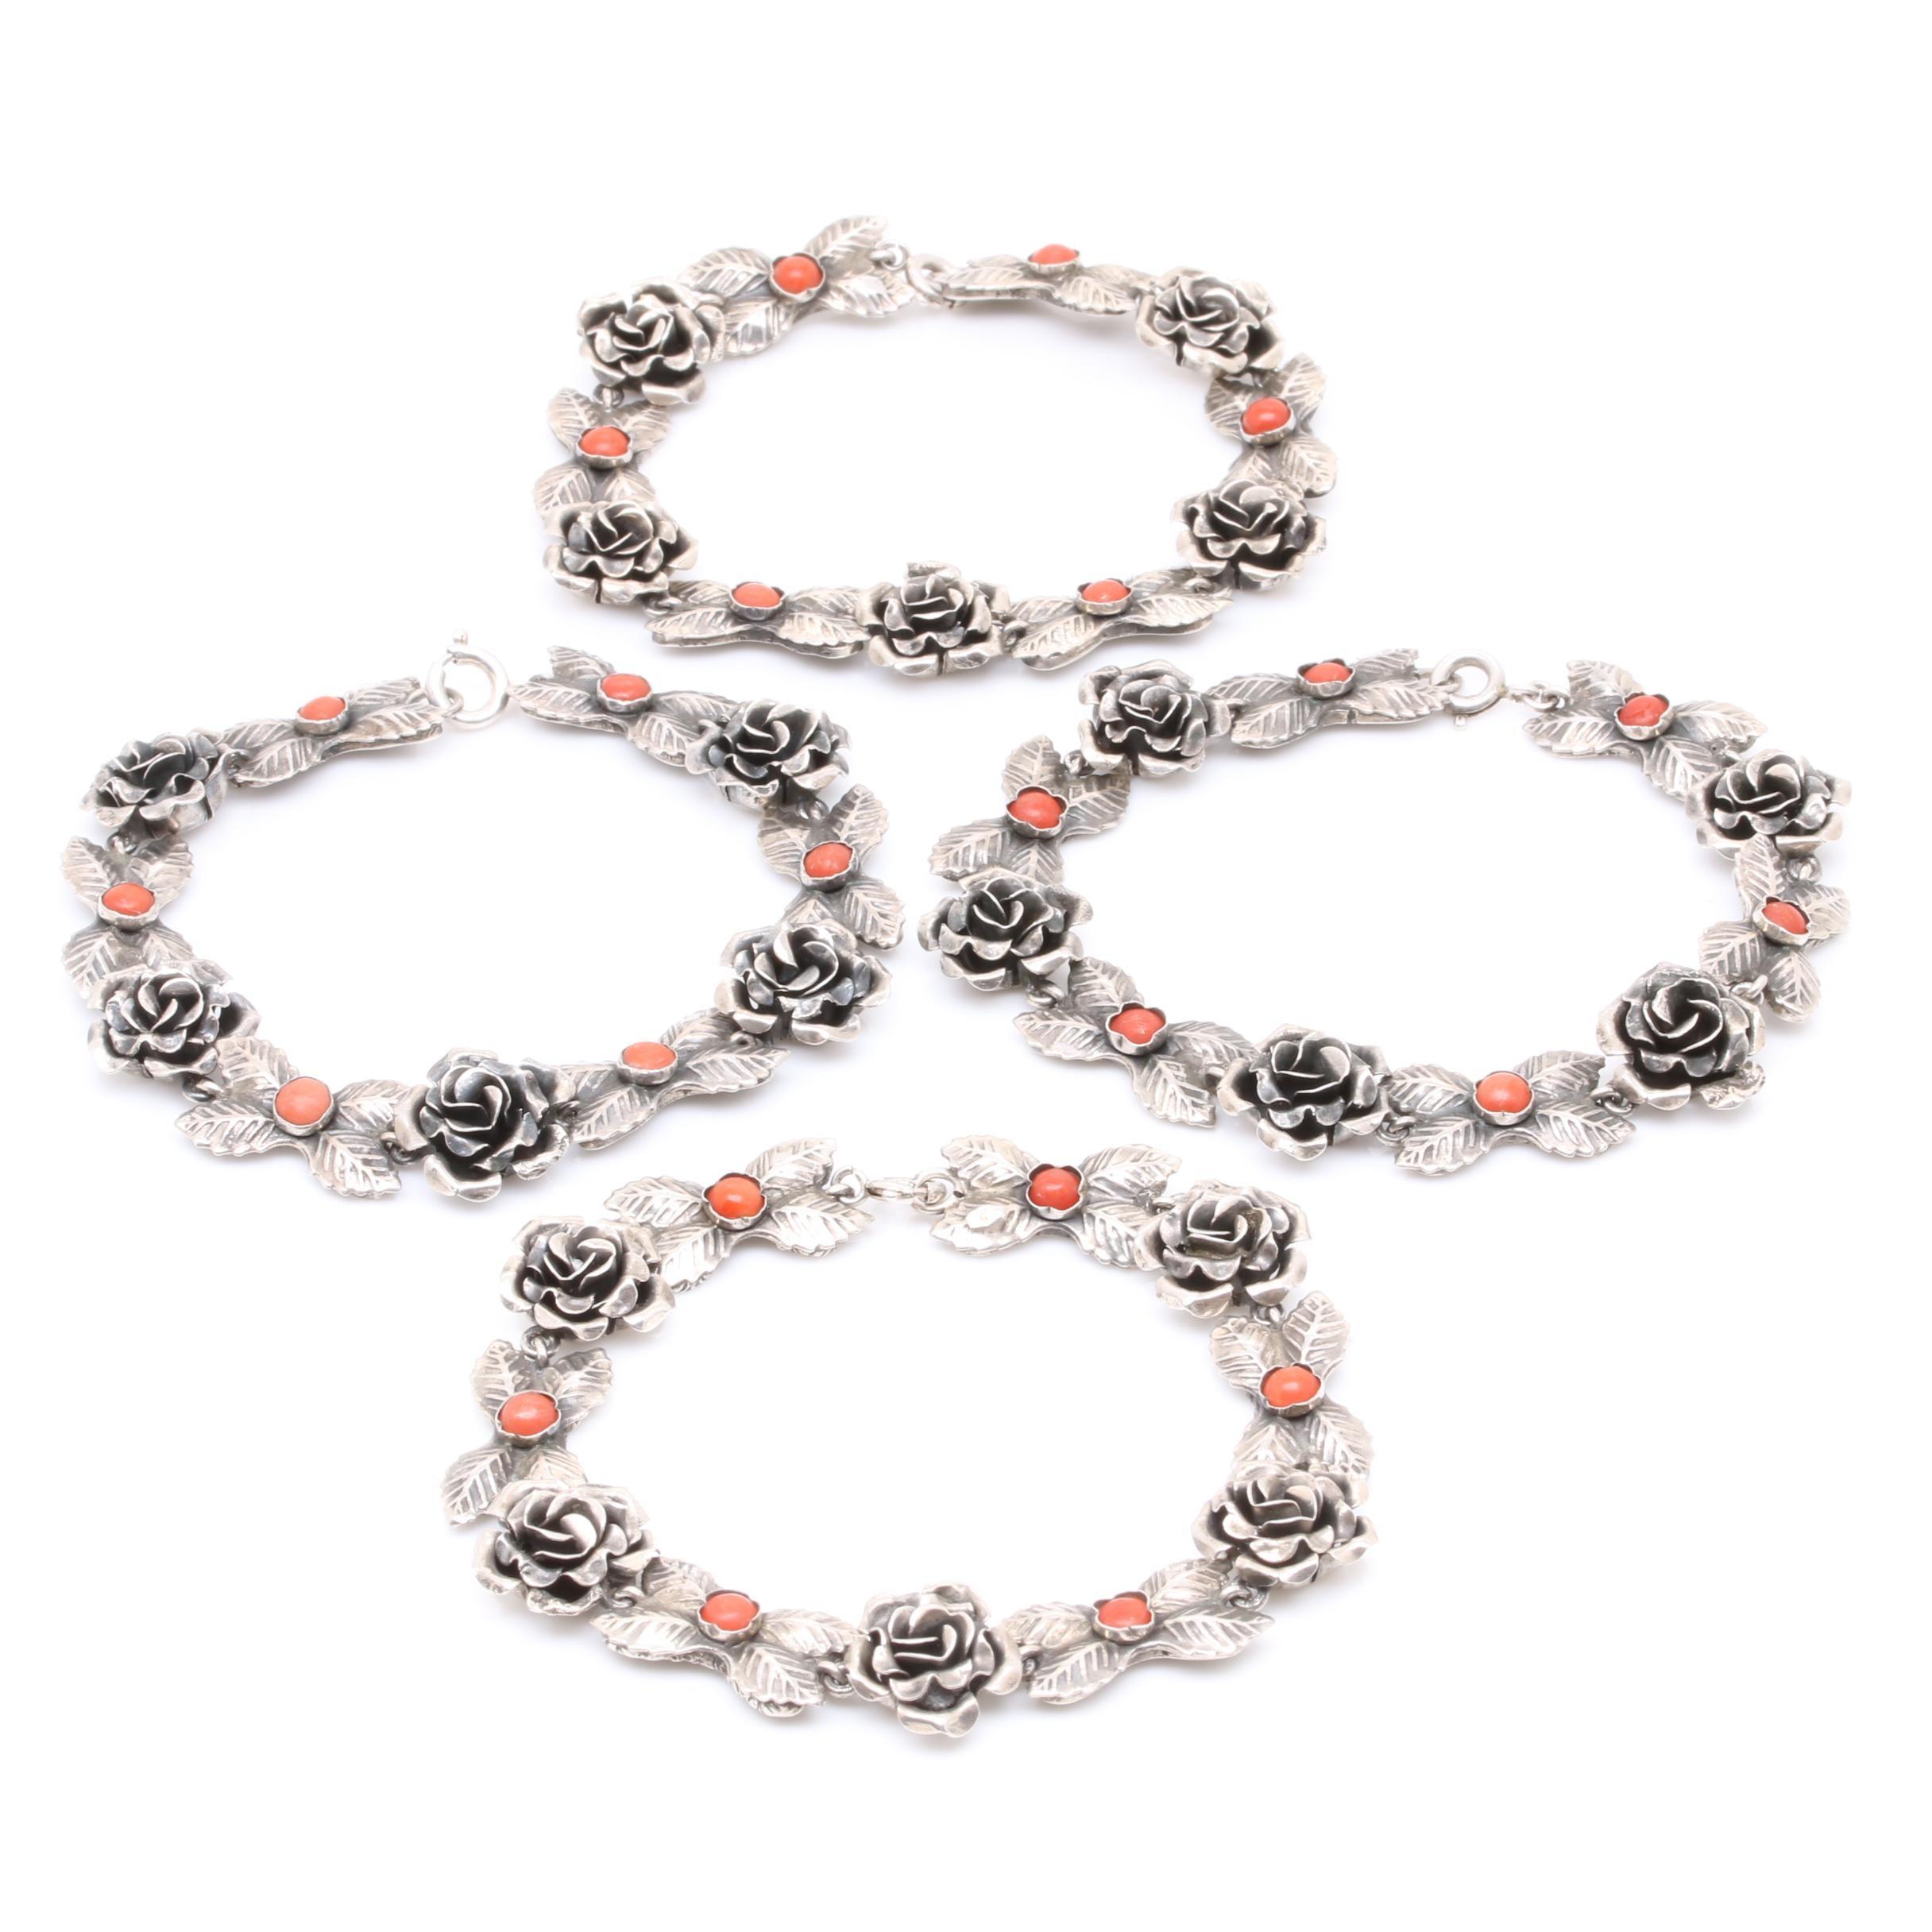 800 Silver Coral Floral Motif Bracelet Necklace Converter